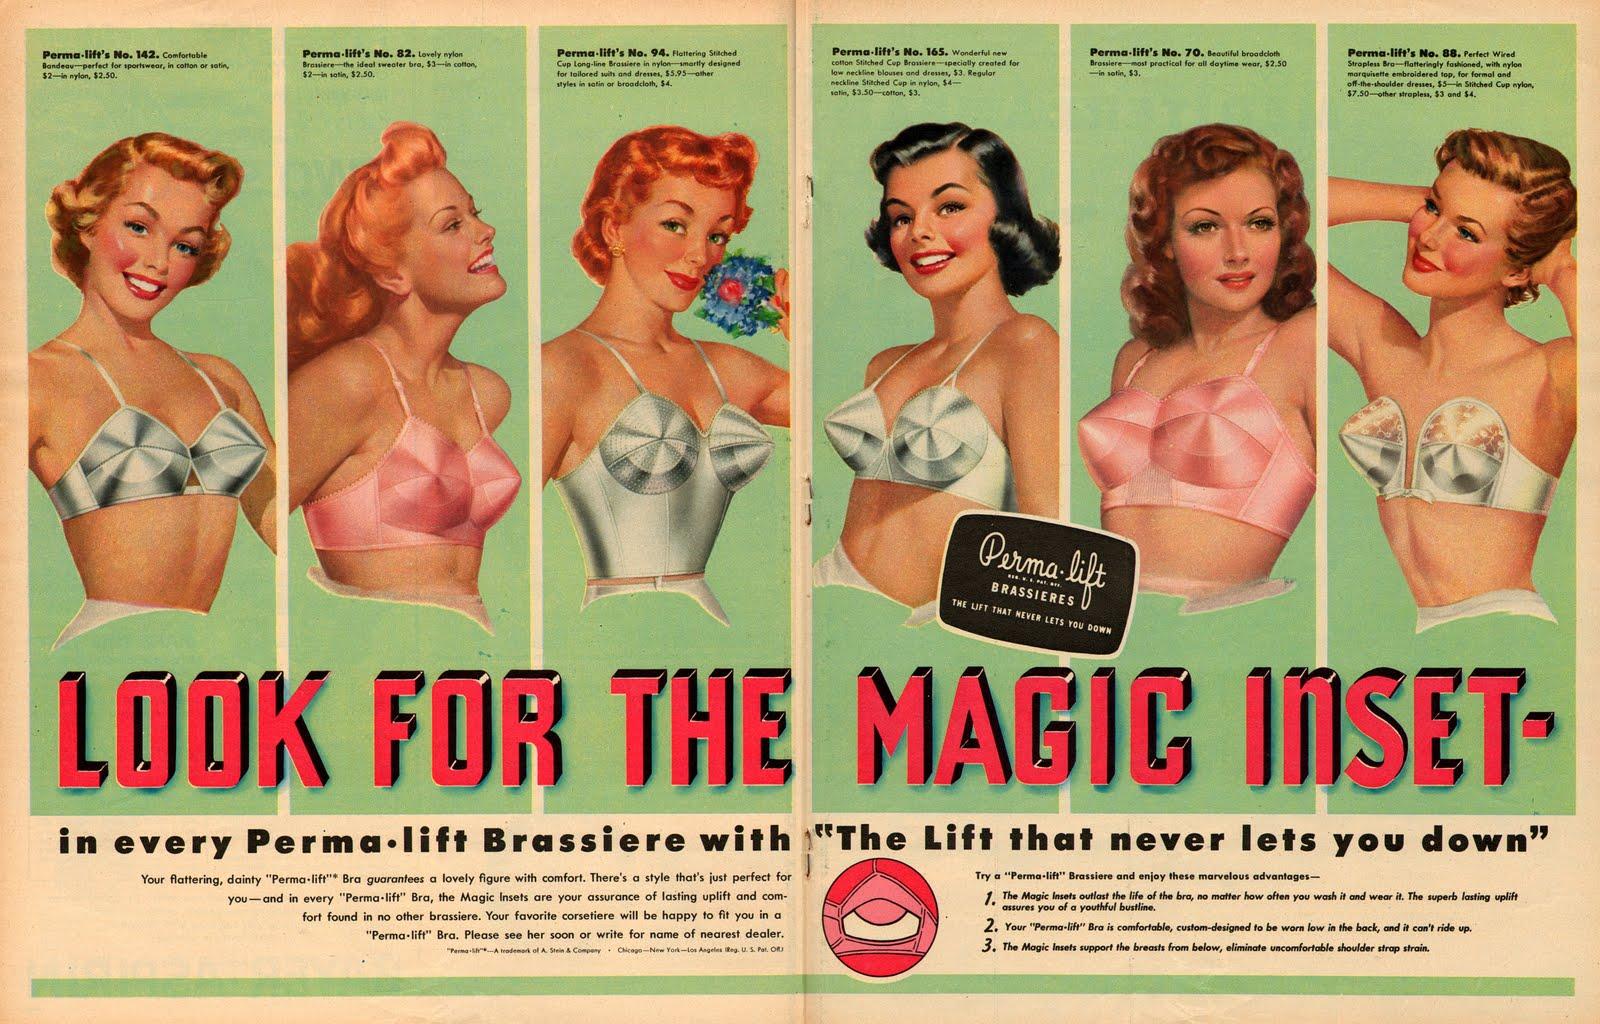 perma-lift_brassieres_ad_1951.JPG